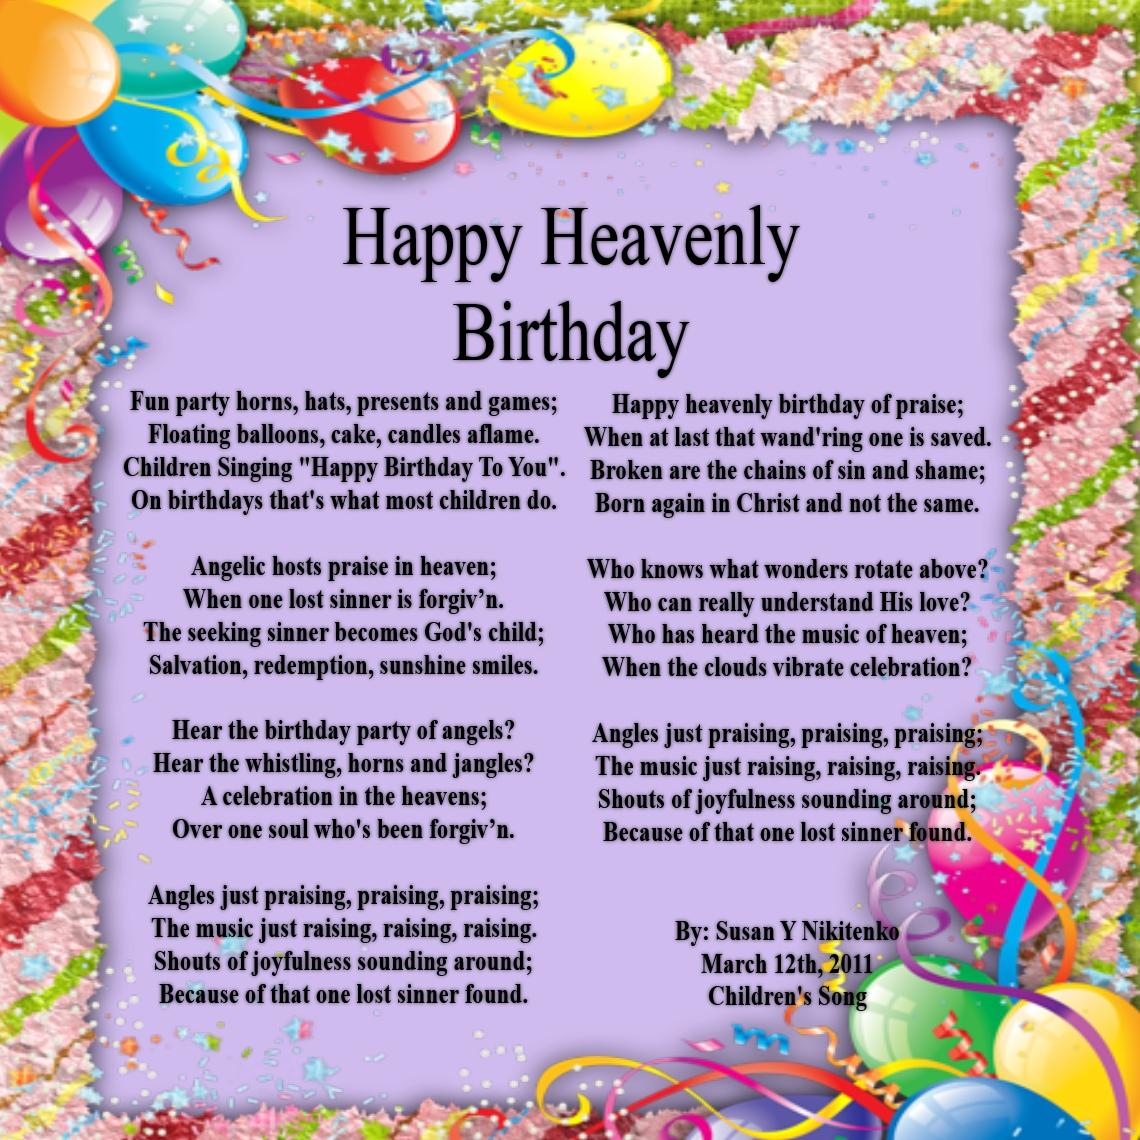 Children's Gems In My Treasure Box: Happy Heavenly